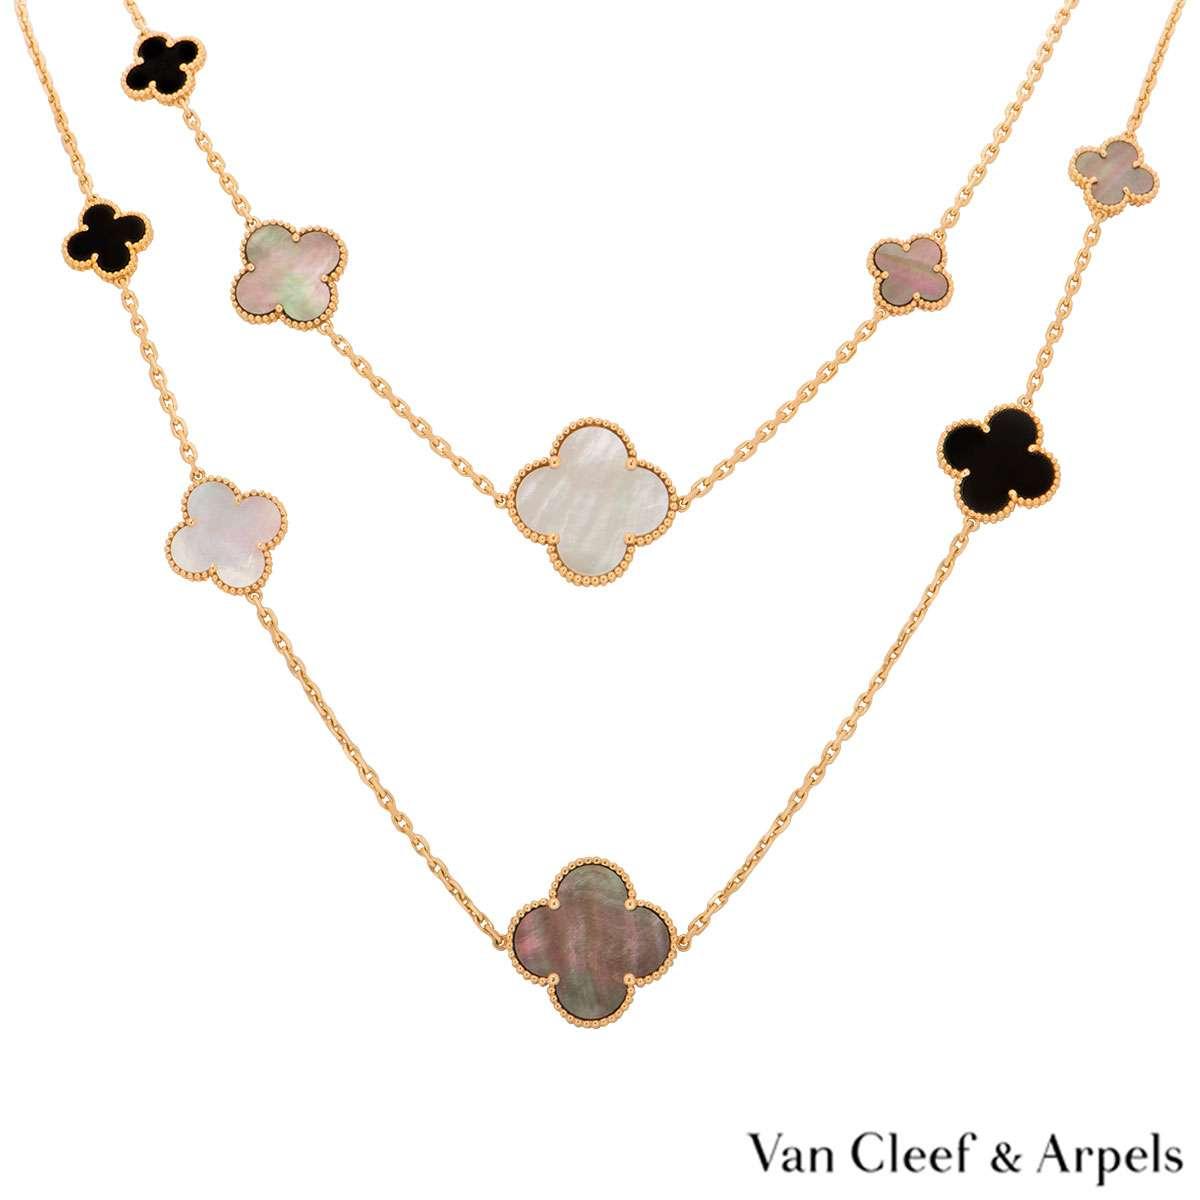 Van Cleef & Arpels Magic Alhambra Necklace VCARD79400